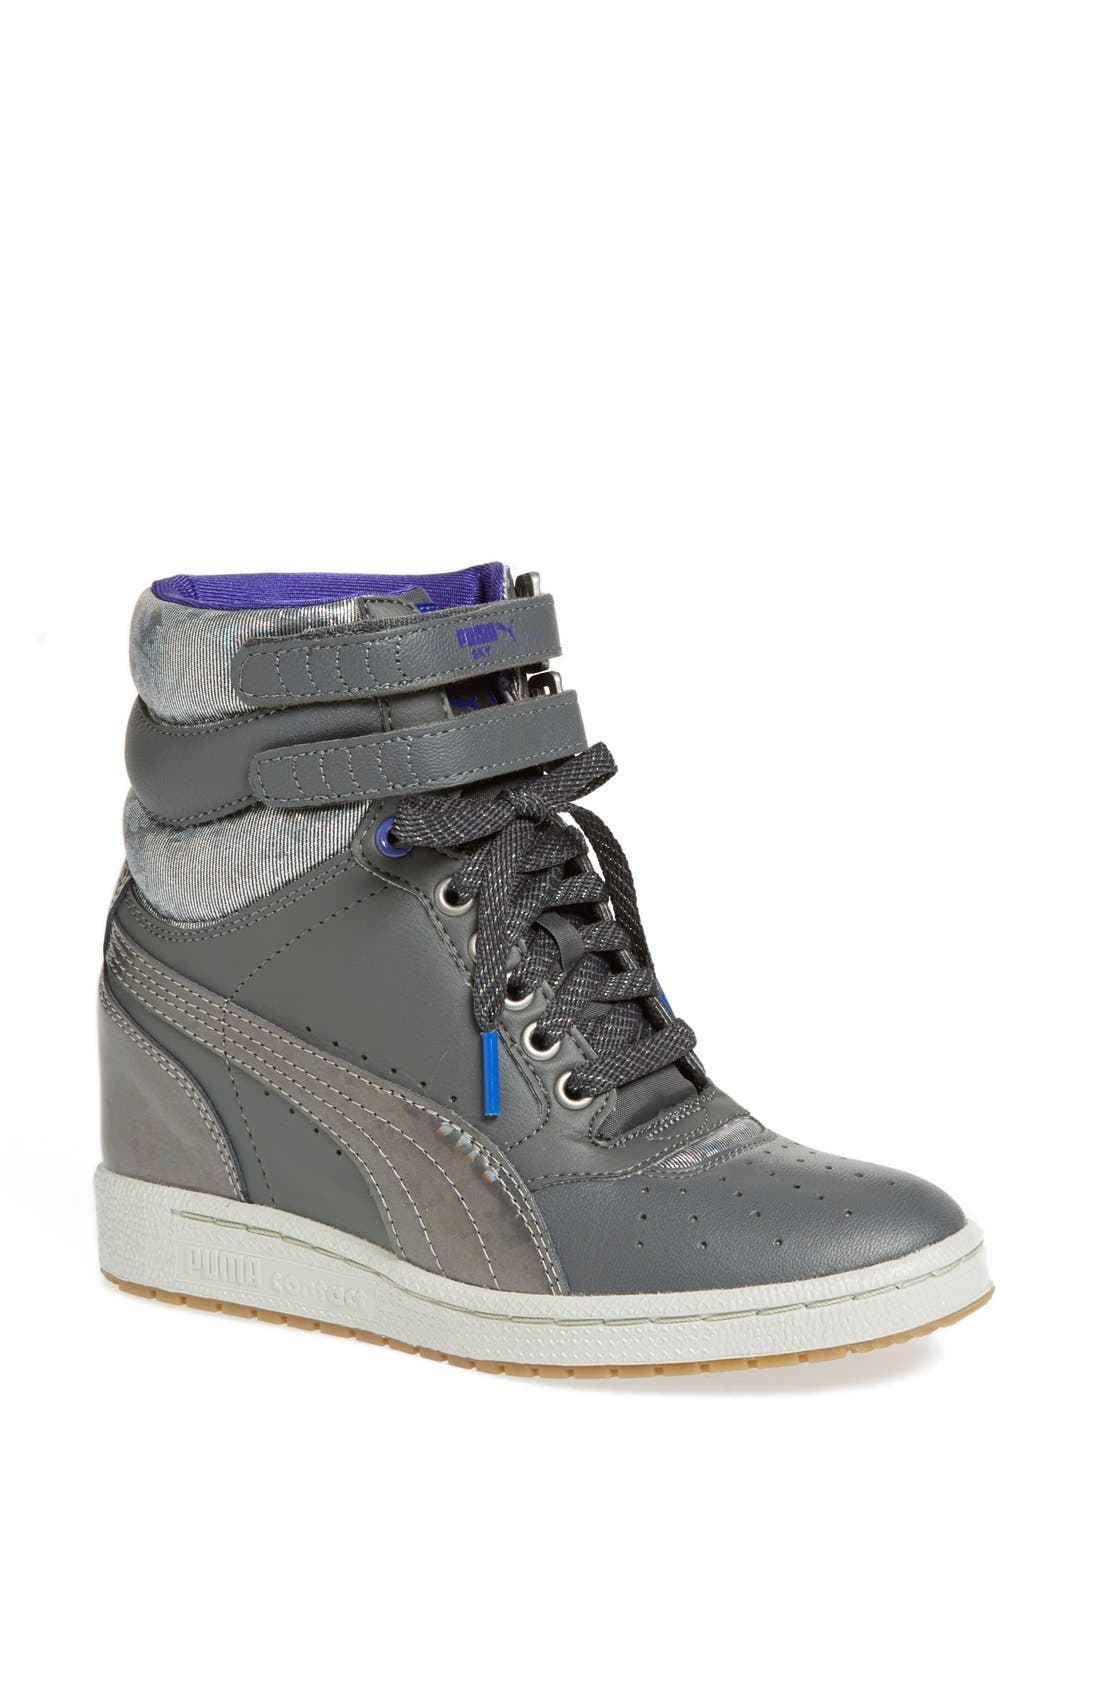 Main Image - PUMA 'Sky Wedge' Sneaker (Women)